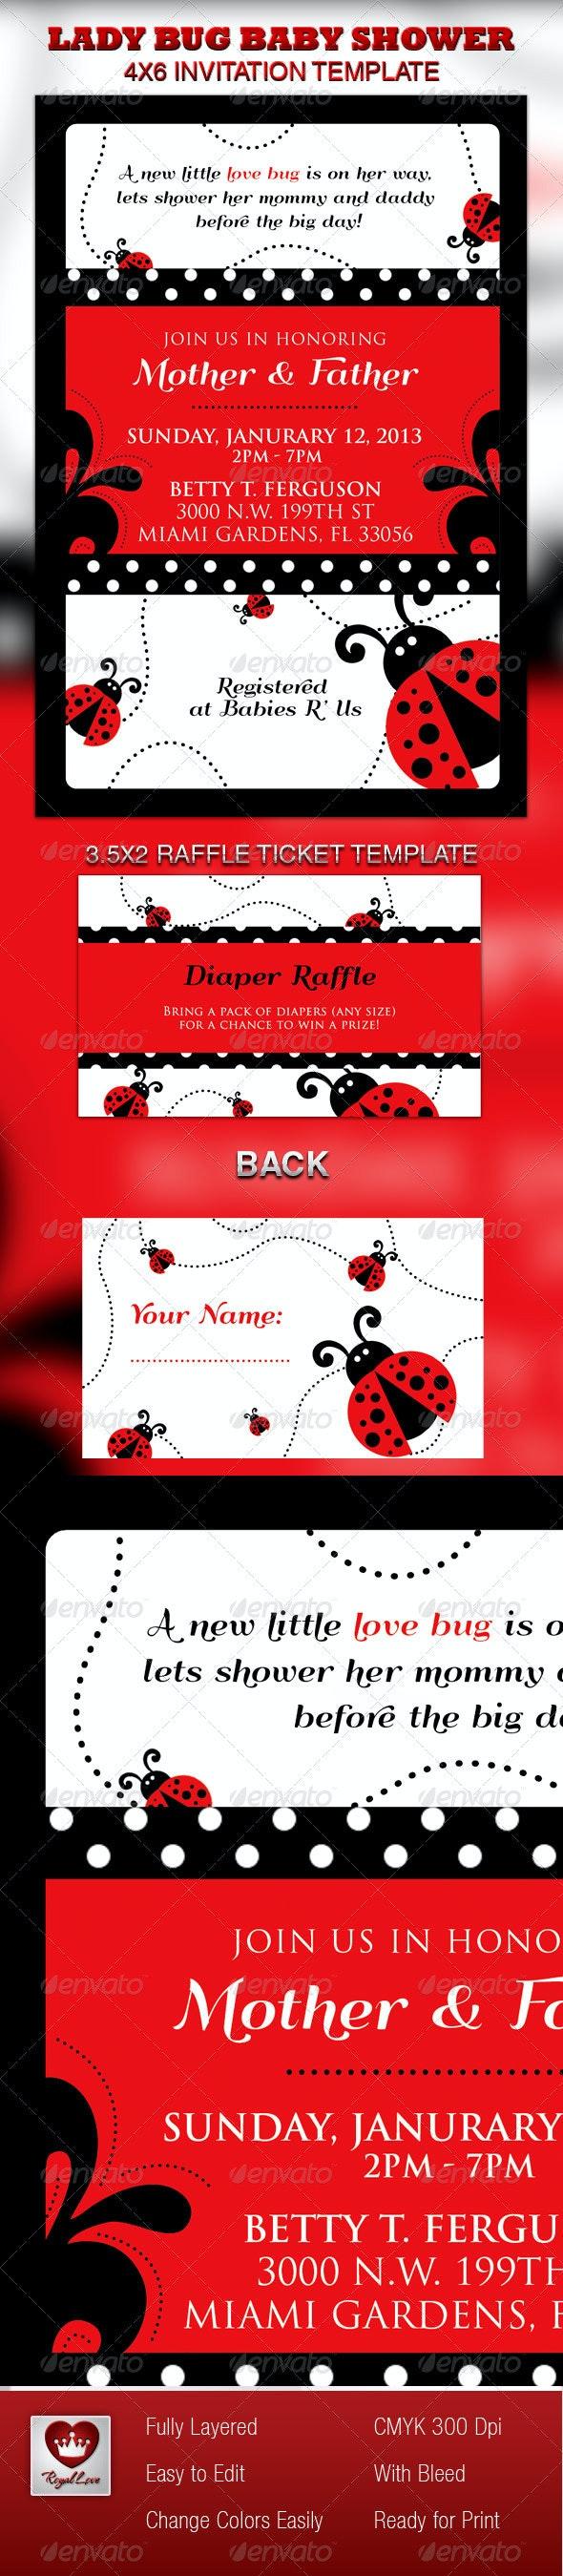 Lady Bug Baby Shower Invitation & Raffle Ticket - Invitations Cards & Invites